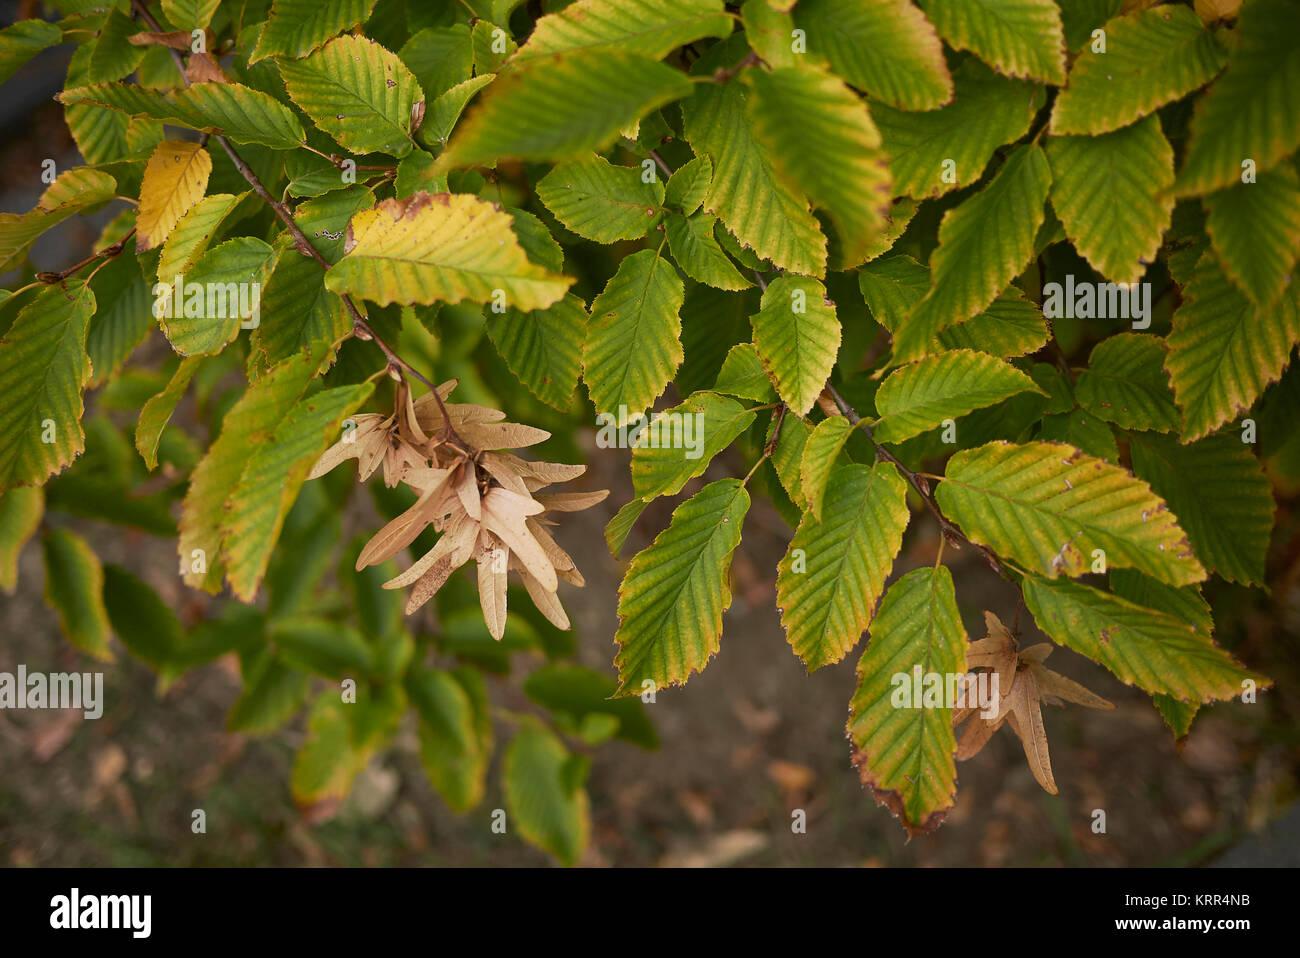 Carpinus betulus - Stock Image